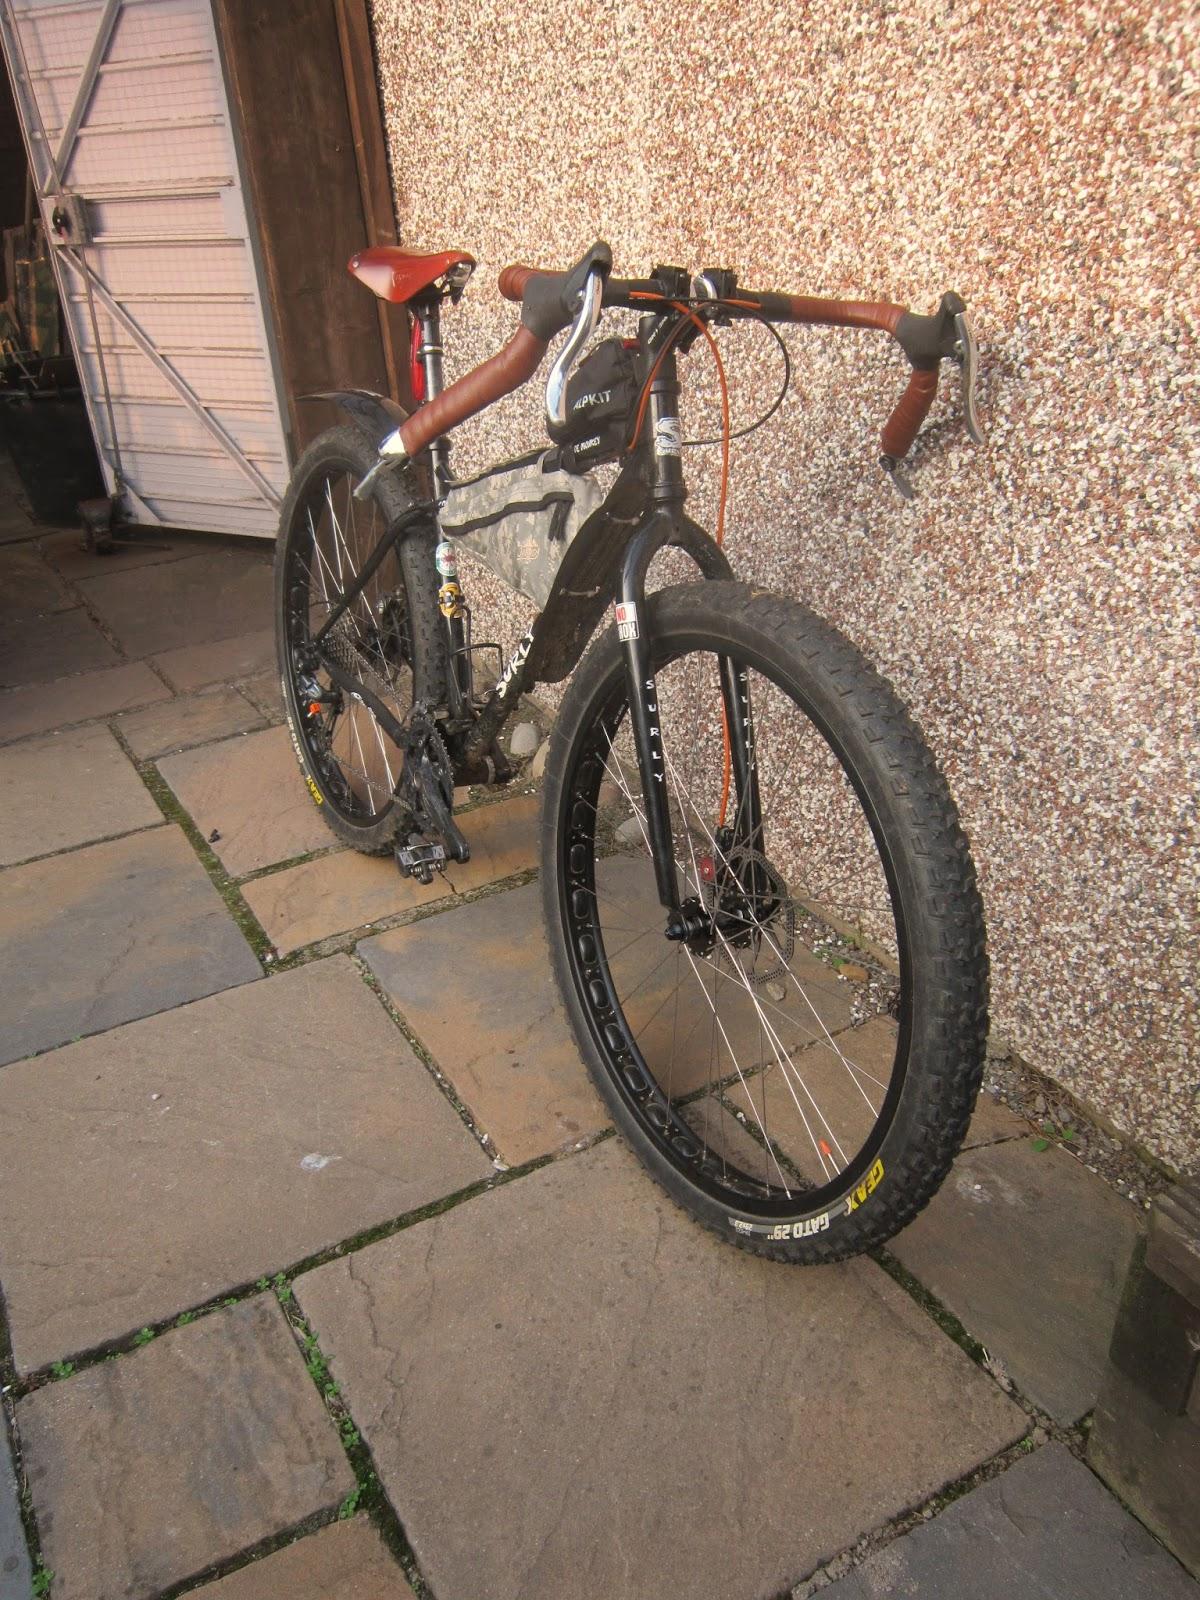 Coastrider The New 26 29 Wheel Tyre Sizes Any Good